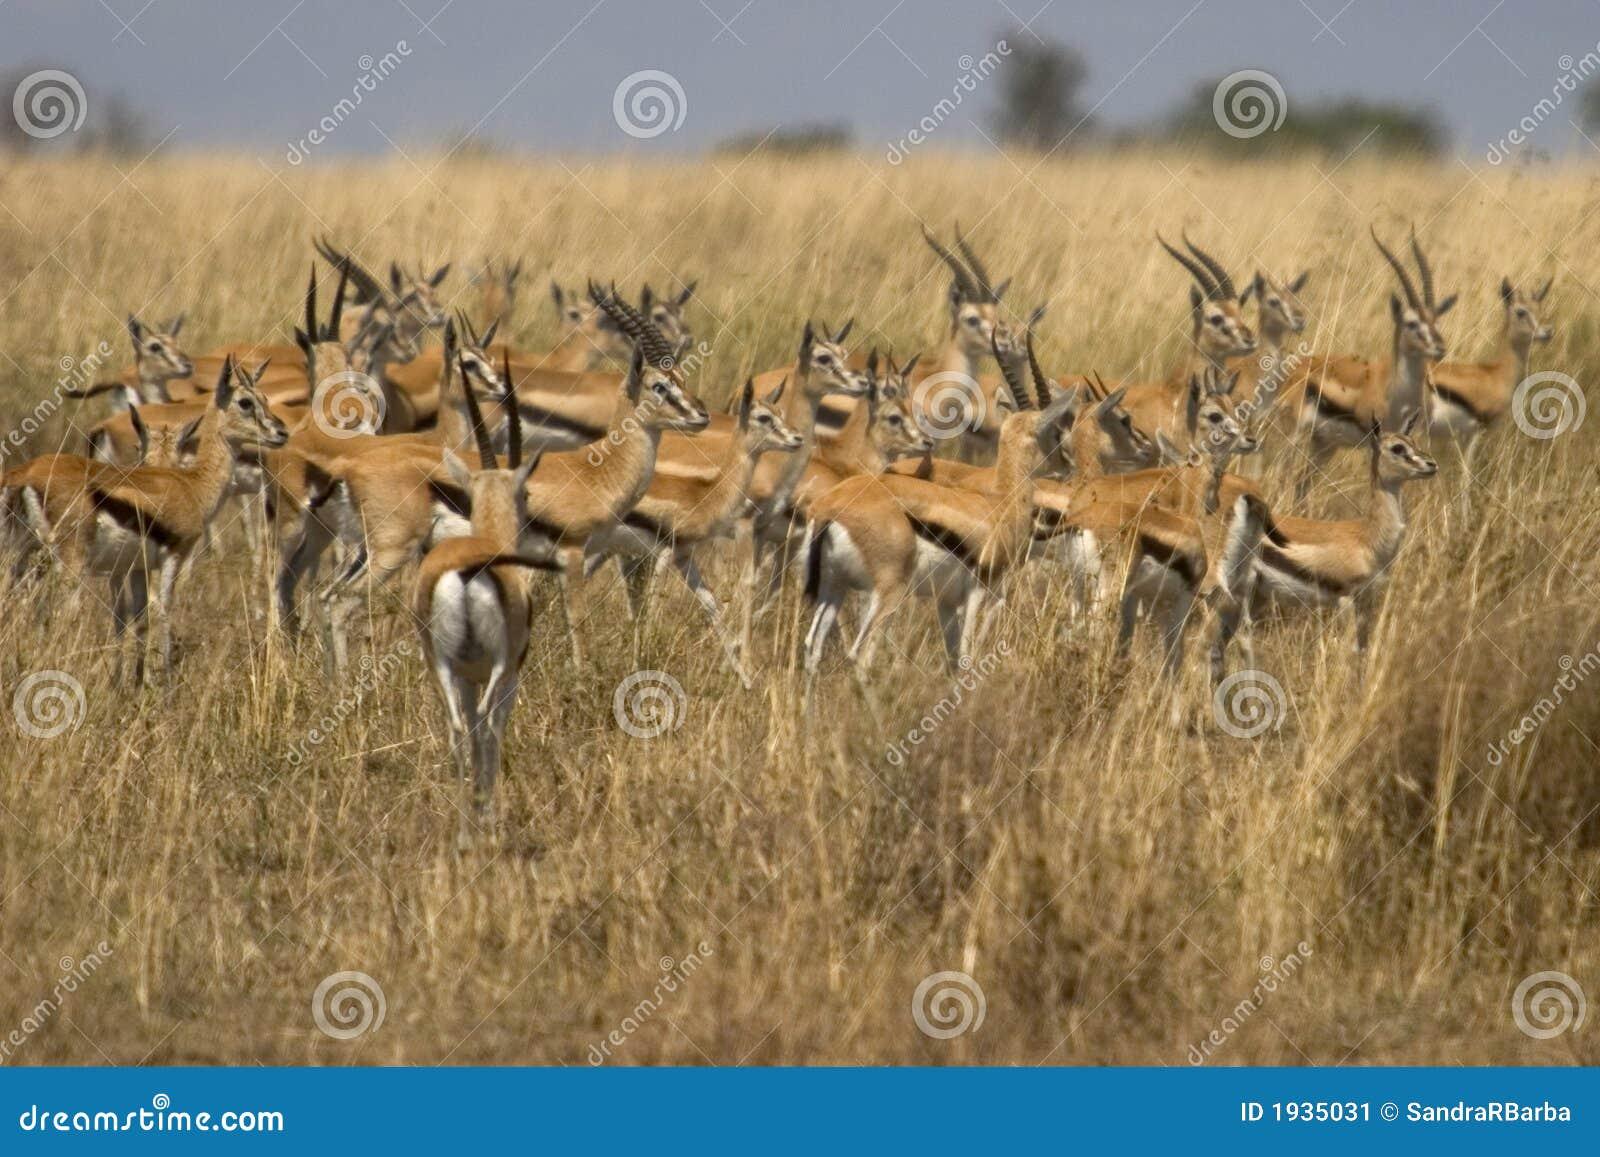 wildes tier in afrika serengeti nationalpark stockbild bild 1935031. Black Bedroom Furniture Sets. Home Design Ideas